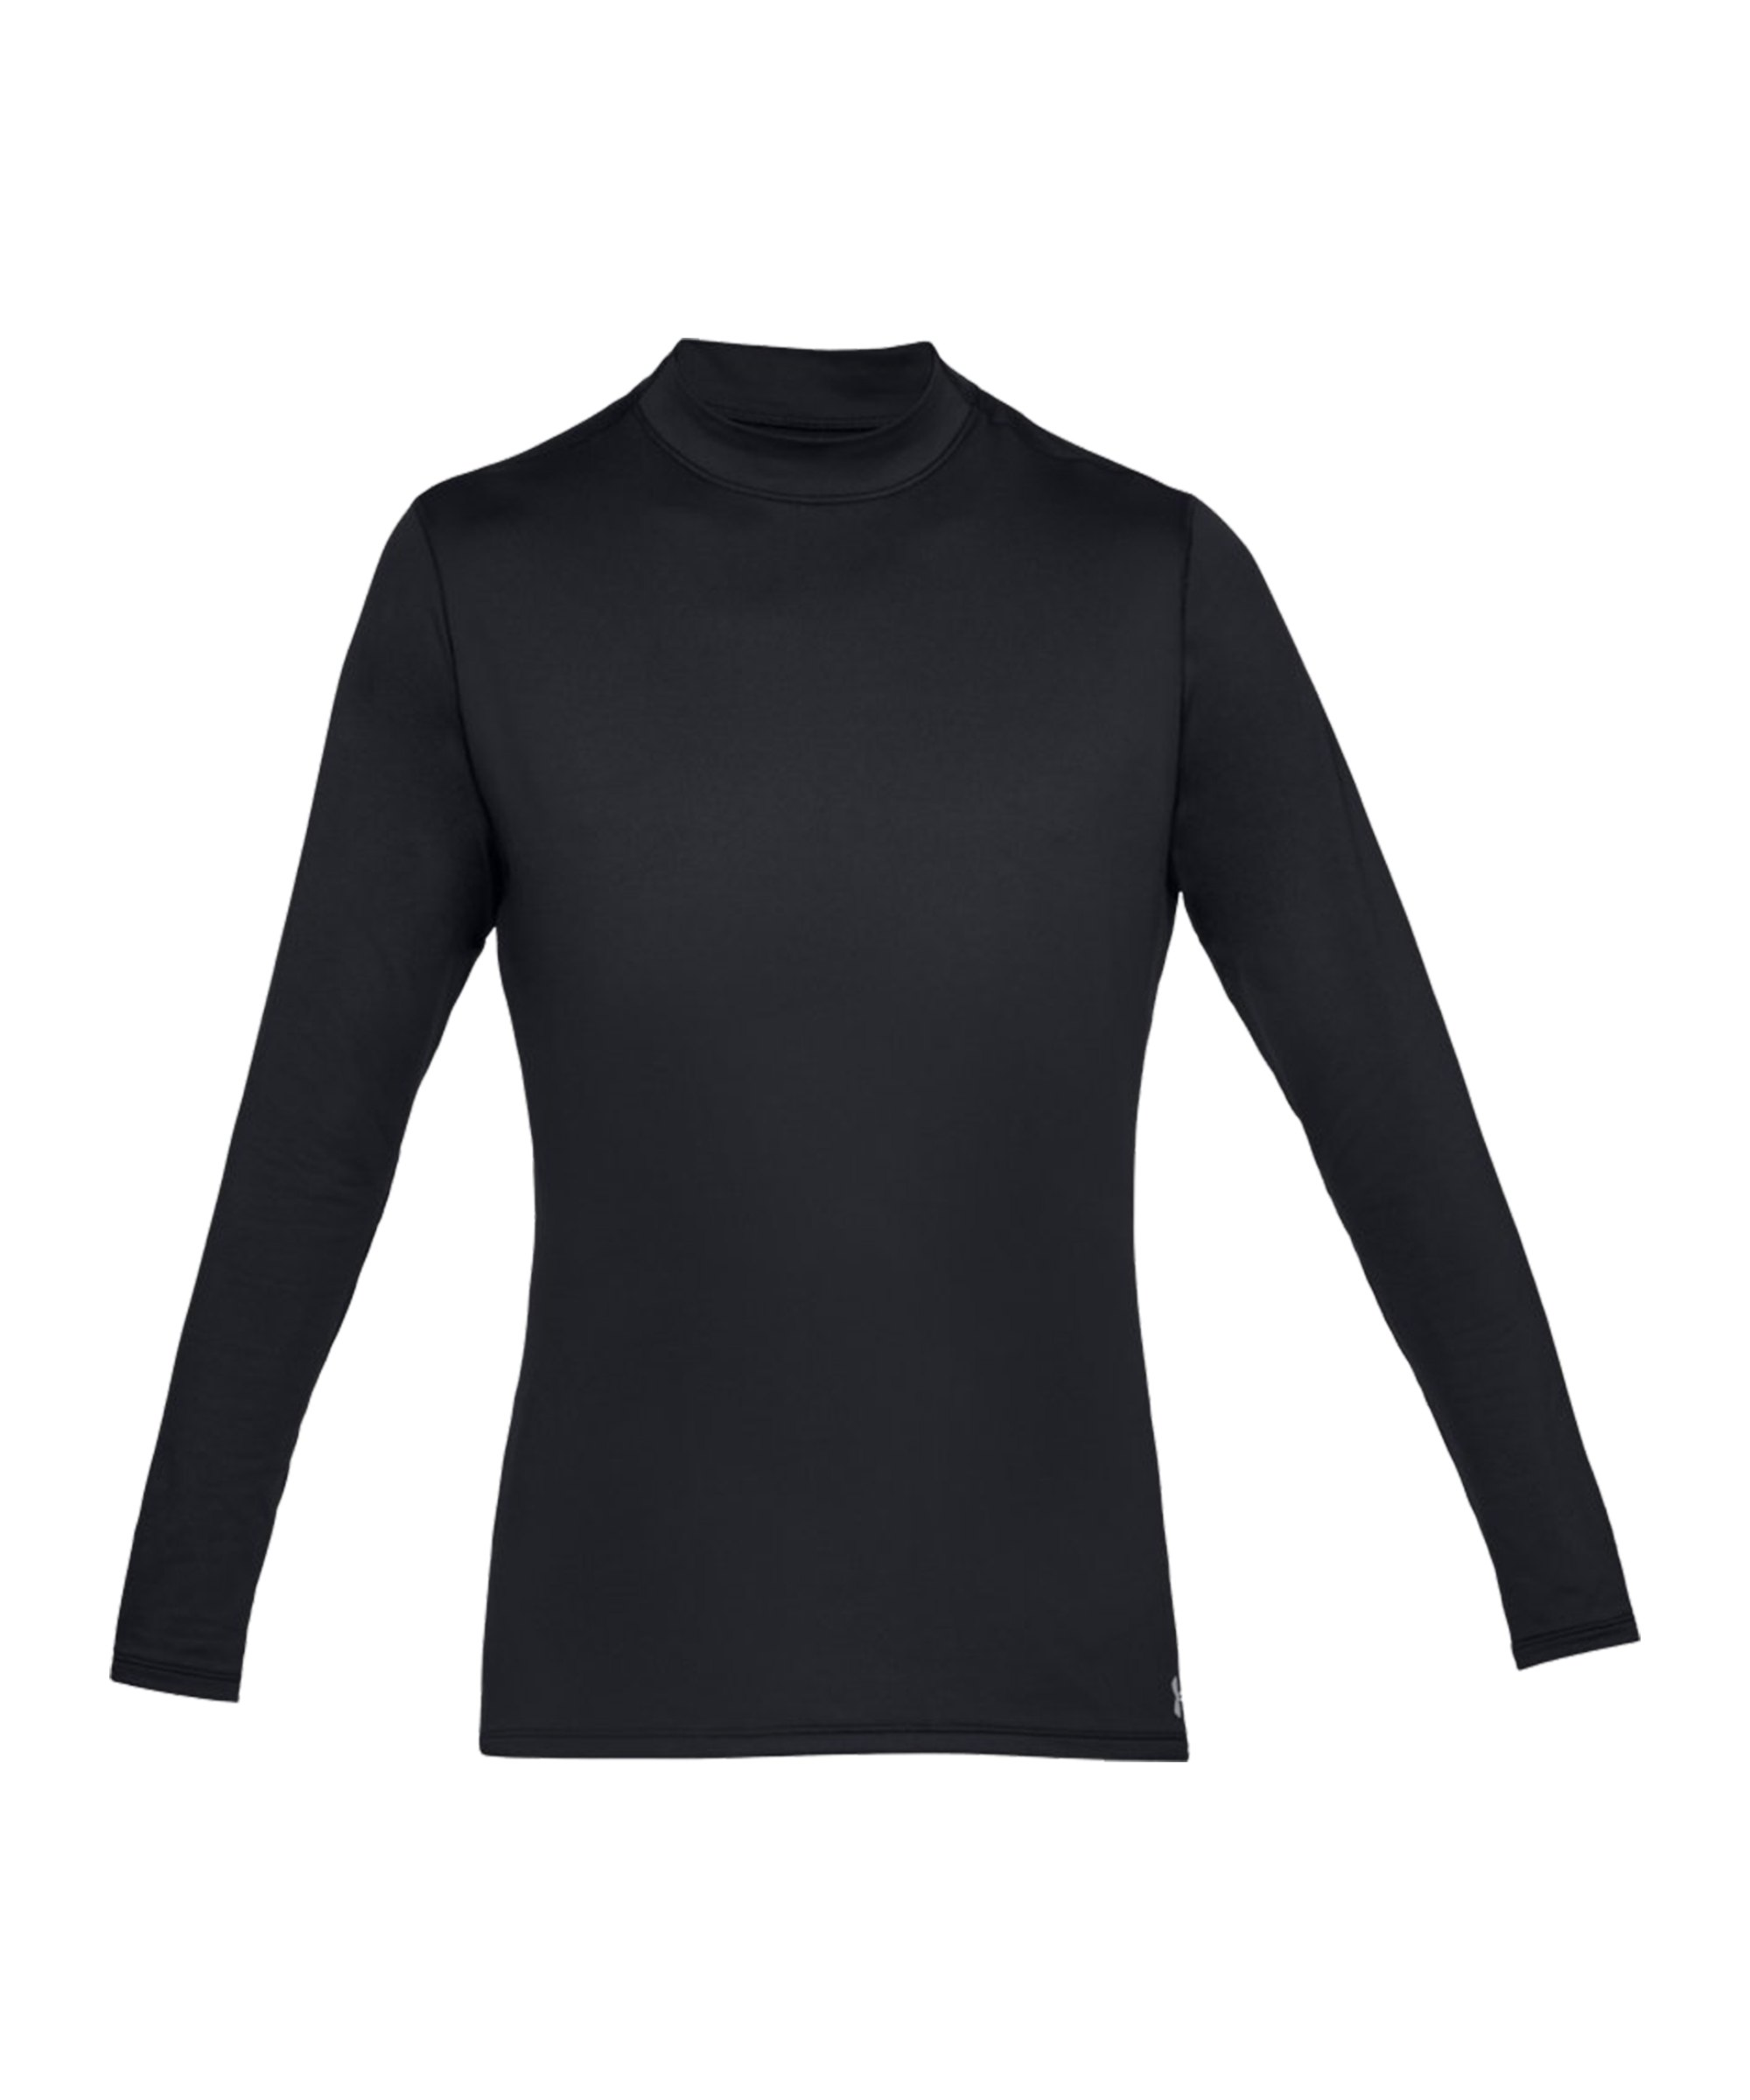 Under Armour ColdGear Fittet Mock Shirt F001 - schwarz